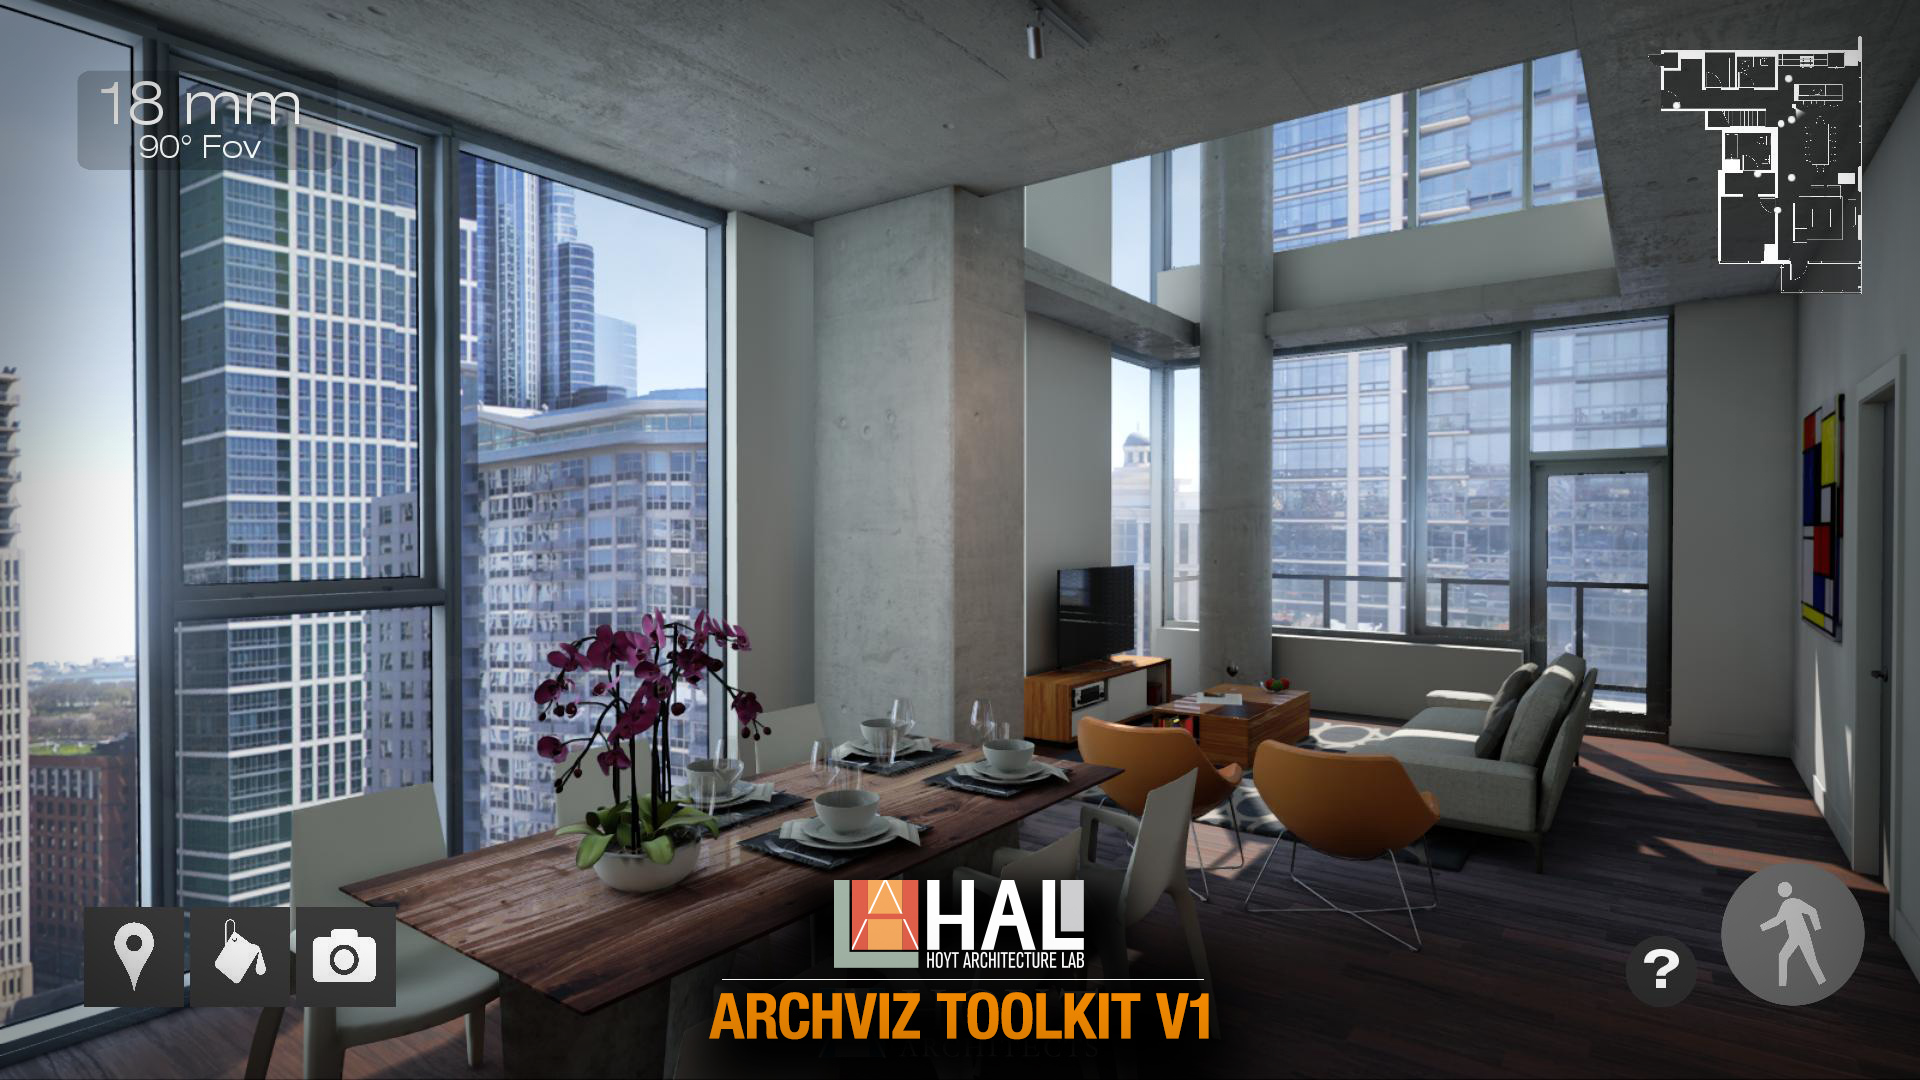 Hal Archviz Toolkit V1 By Hal In Architectural